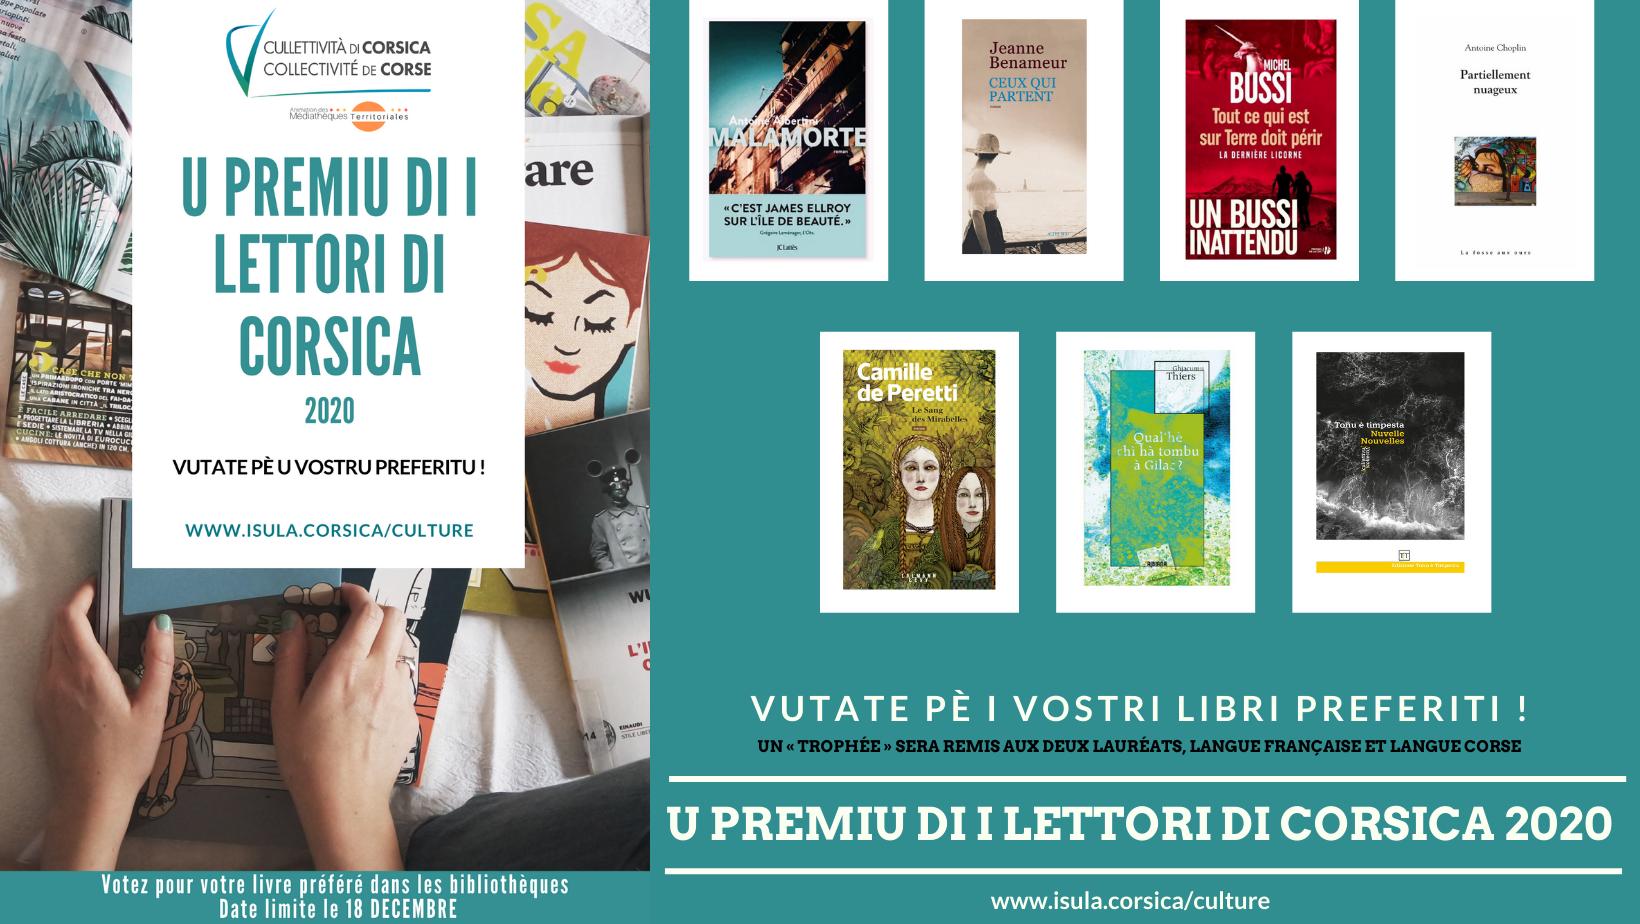 PREMIU DI I LETTORI DI CORSICA 2020 / PROLONGATION DE DATE DE VOTE AU 28 OCTOBRE !